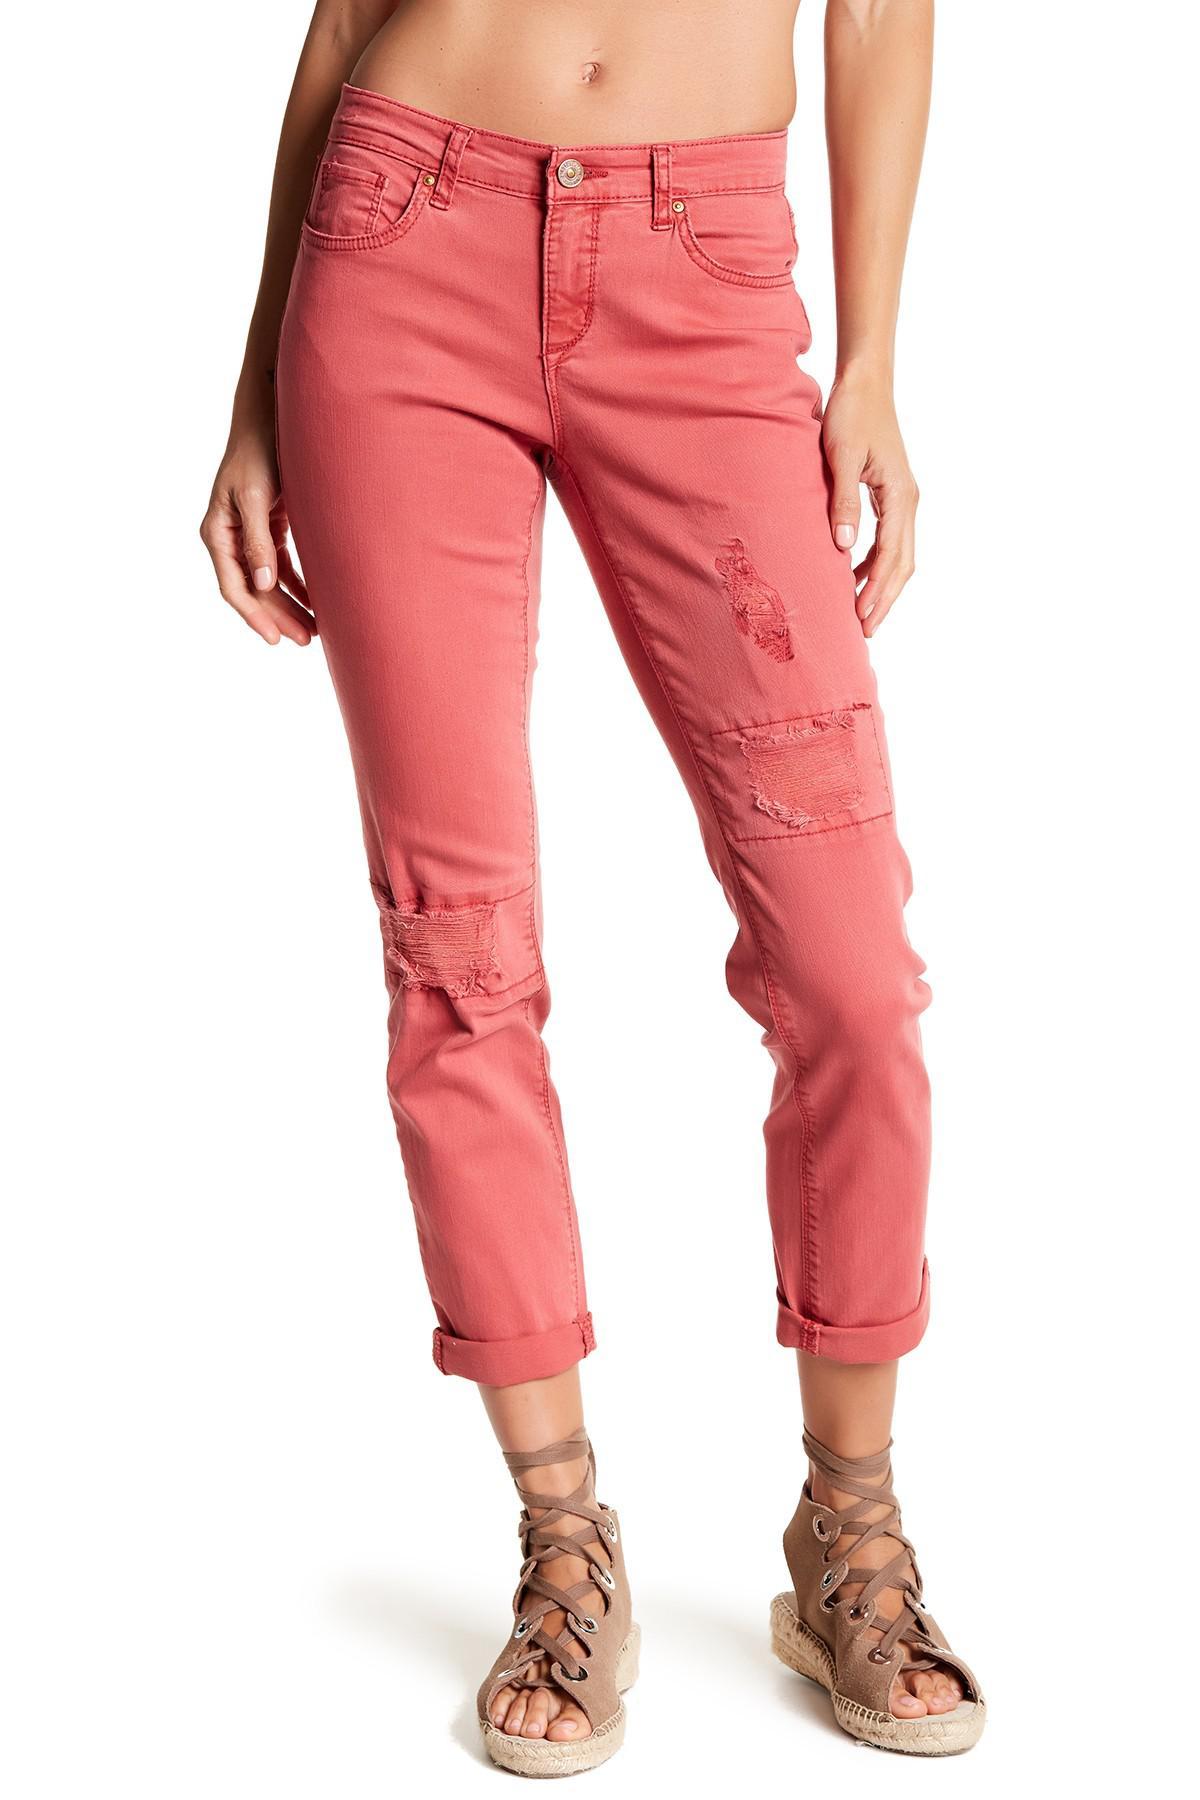 Red vintage jeans